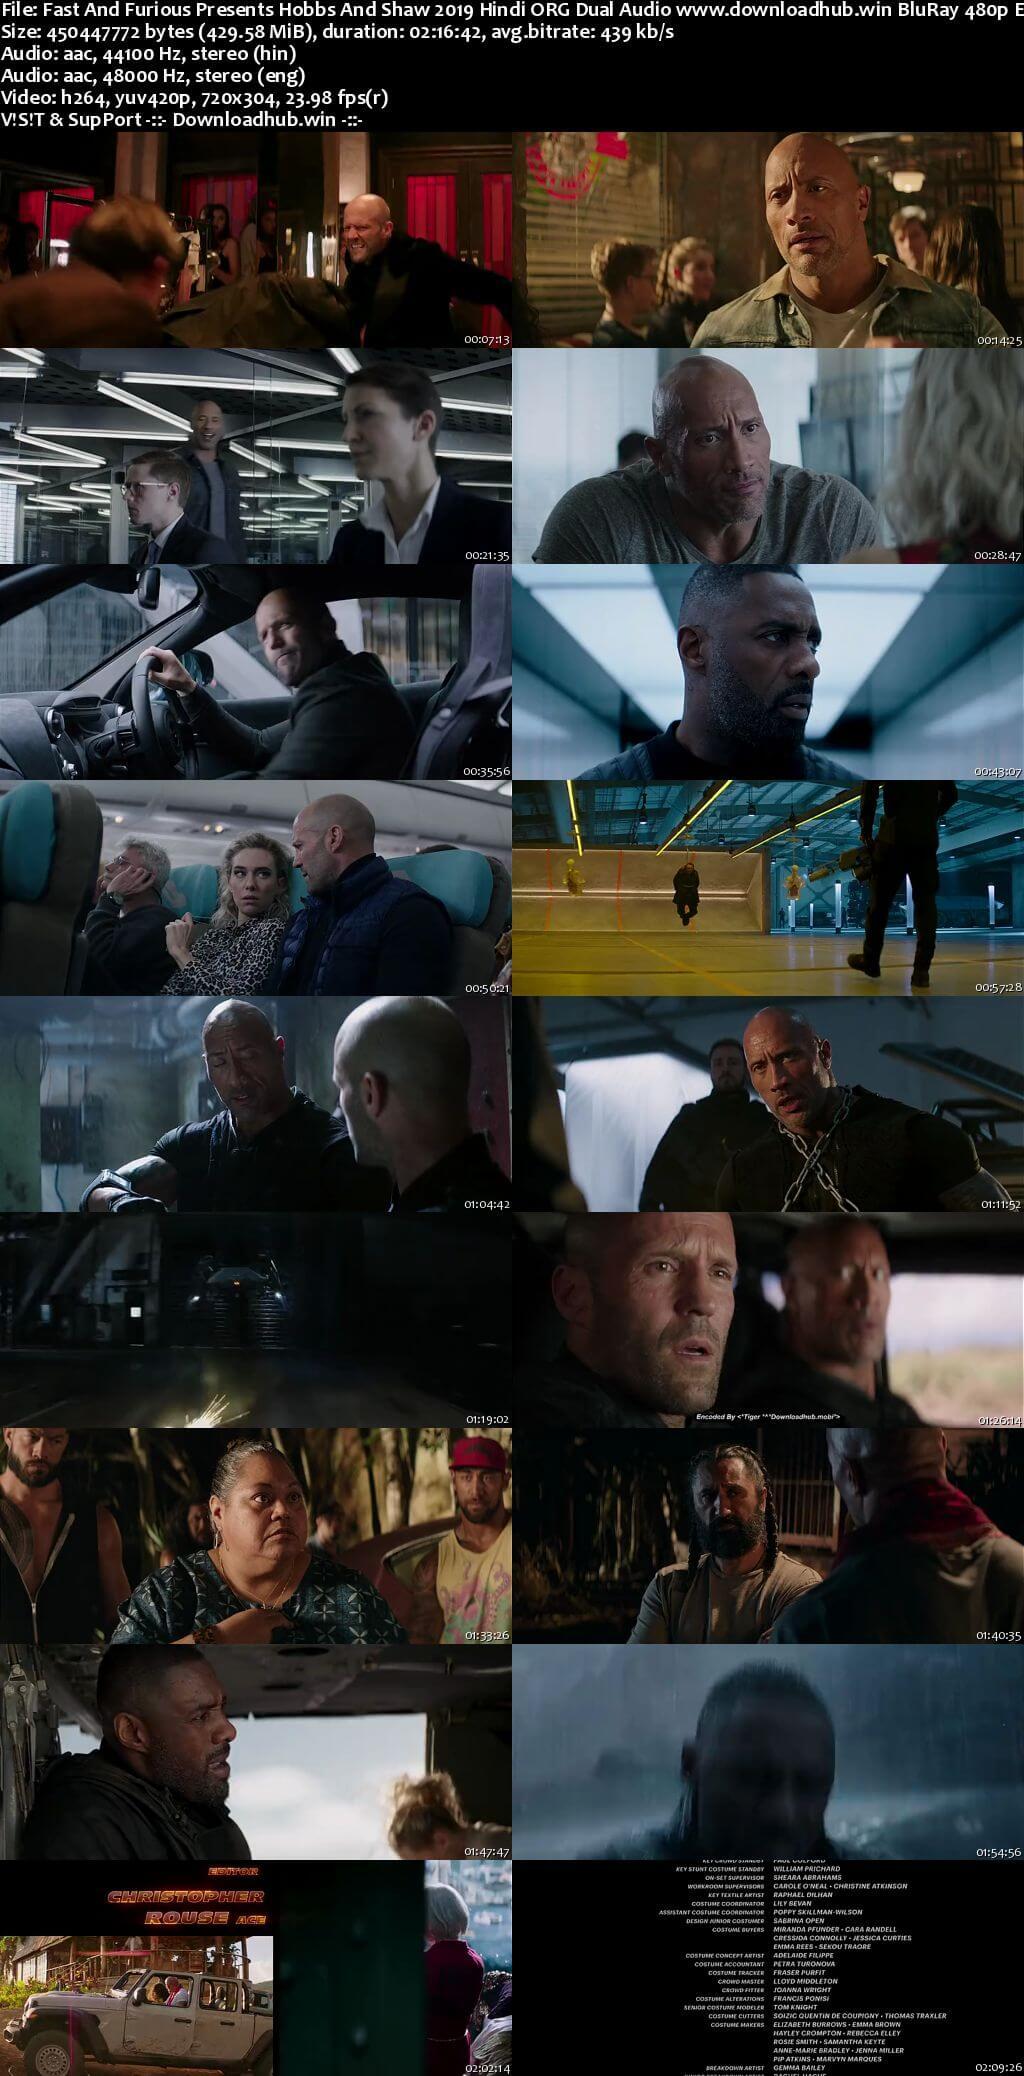 Fast And Furious Presents Hobbs And Shaw 2019 Hindi ORG Dual Audio 400MB BluRay 480p ESubs